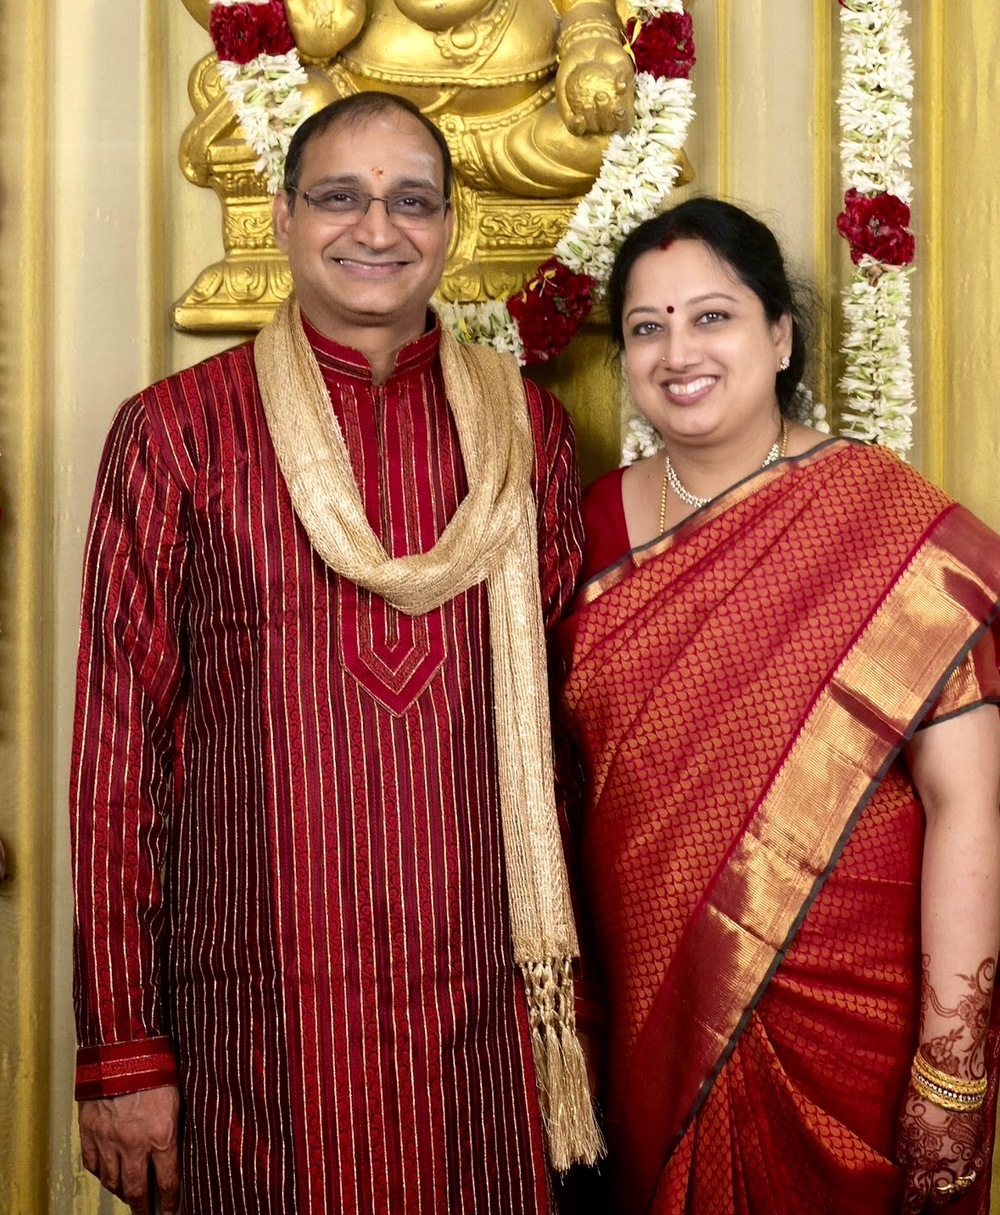 Sri Raghu Ranganathan and Smt Akhila Ranganathan